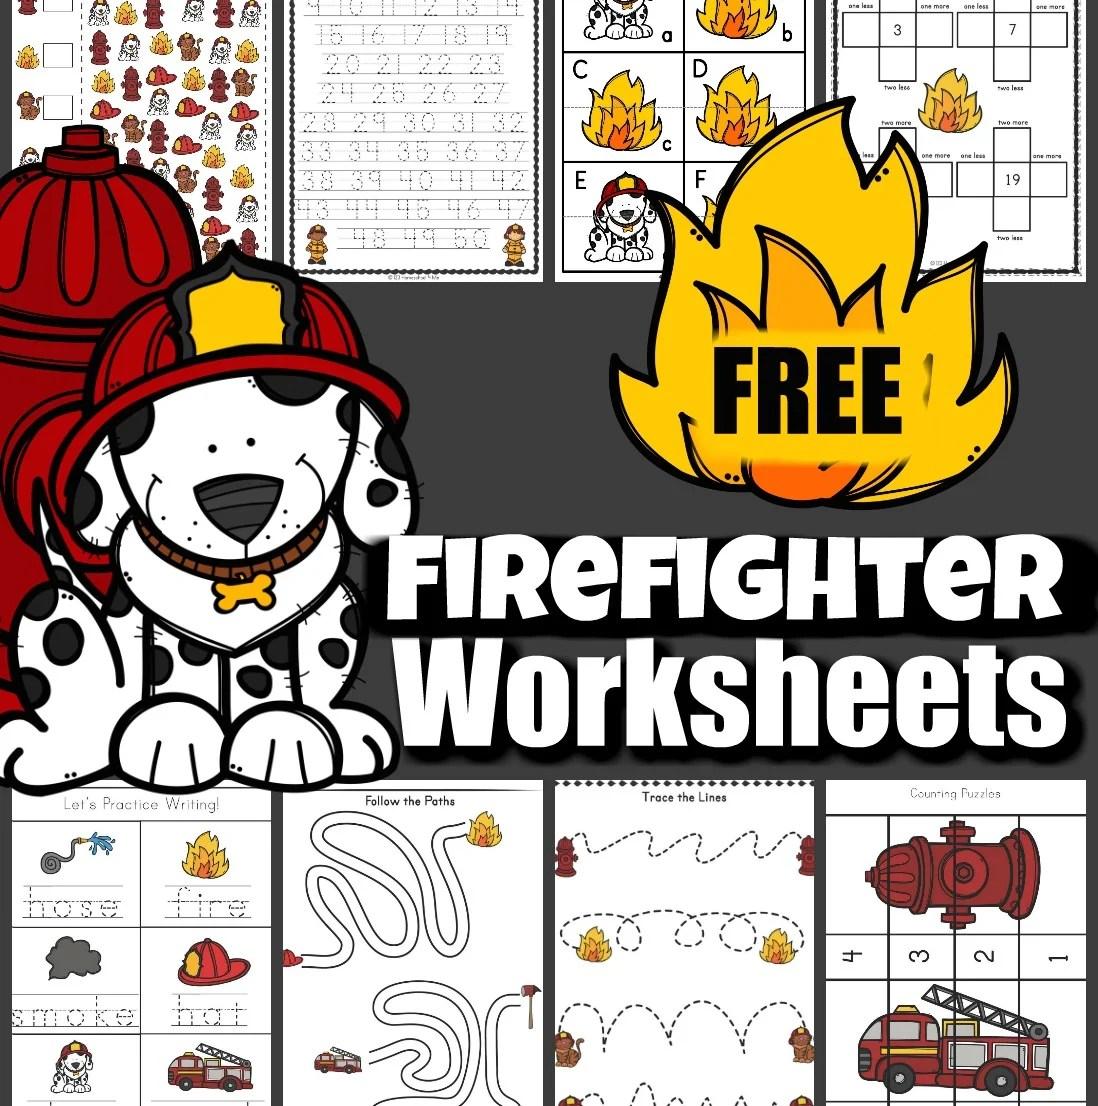 Free Firefighter Worksheets